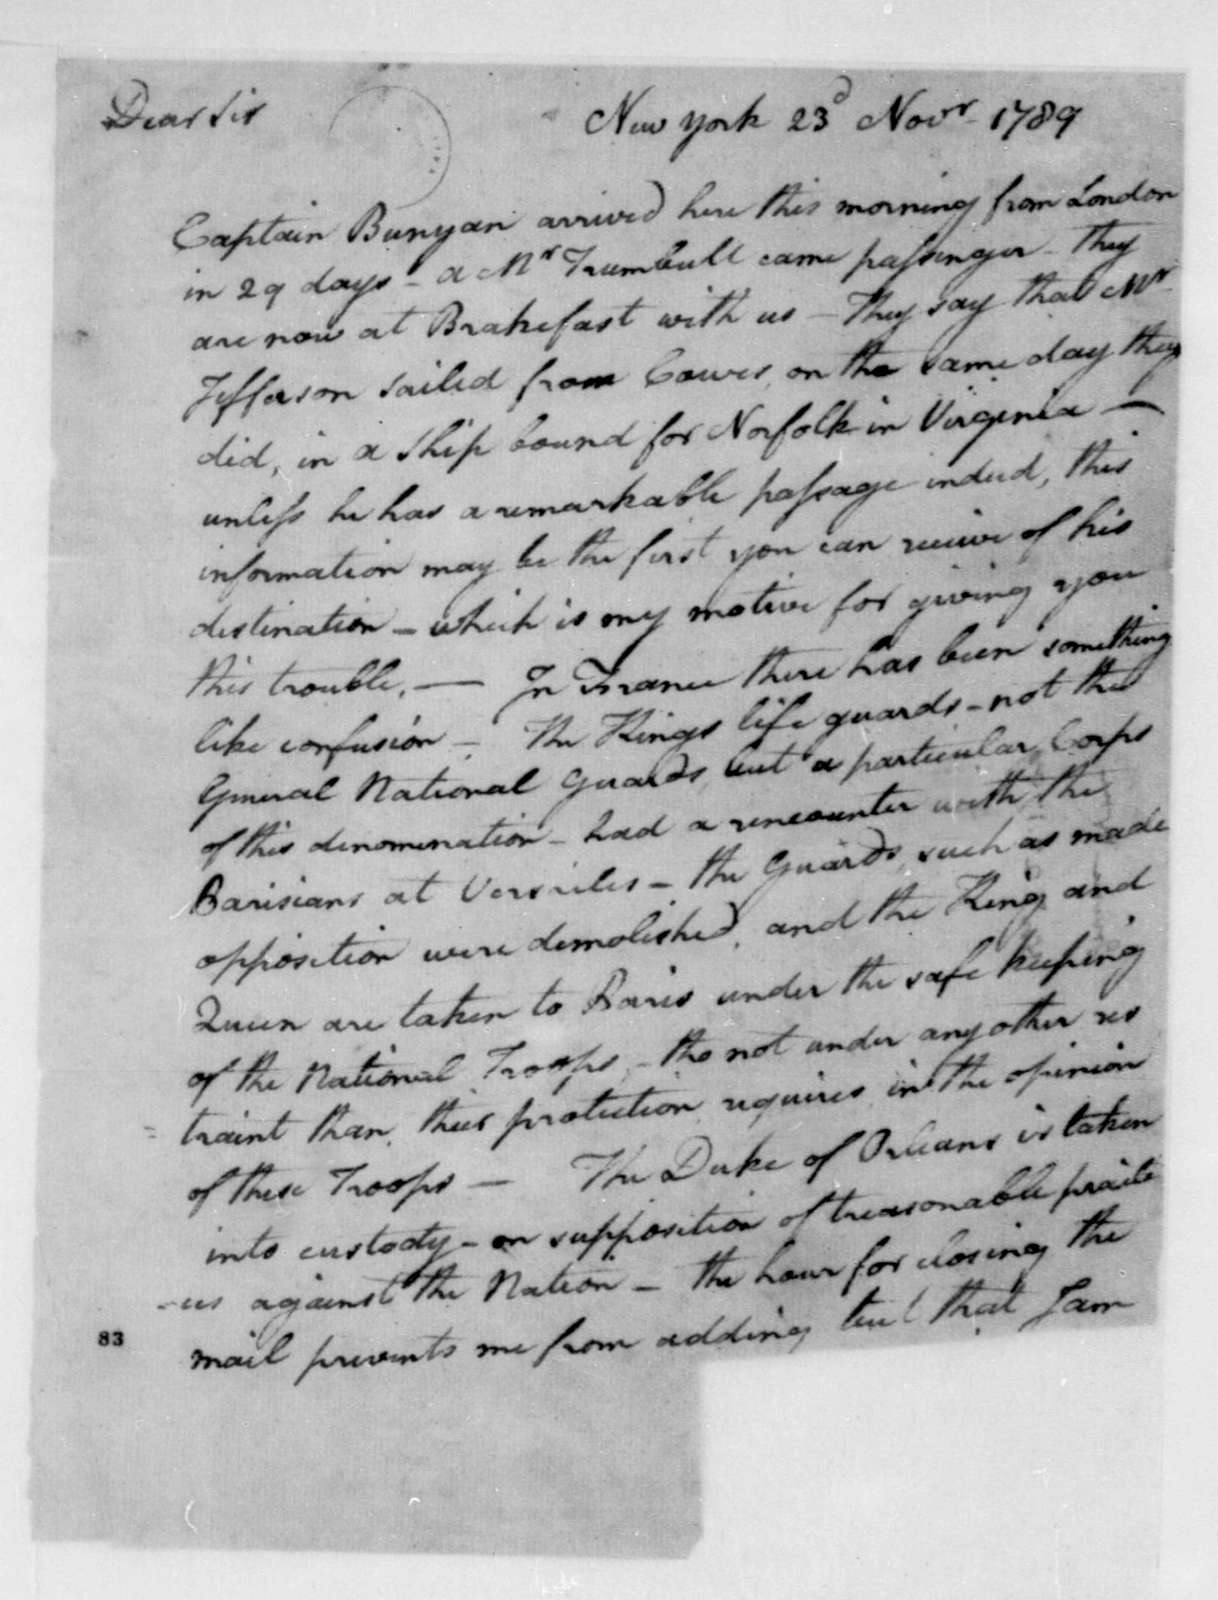 William Irvine to James Madison, November 23, 1789.